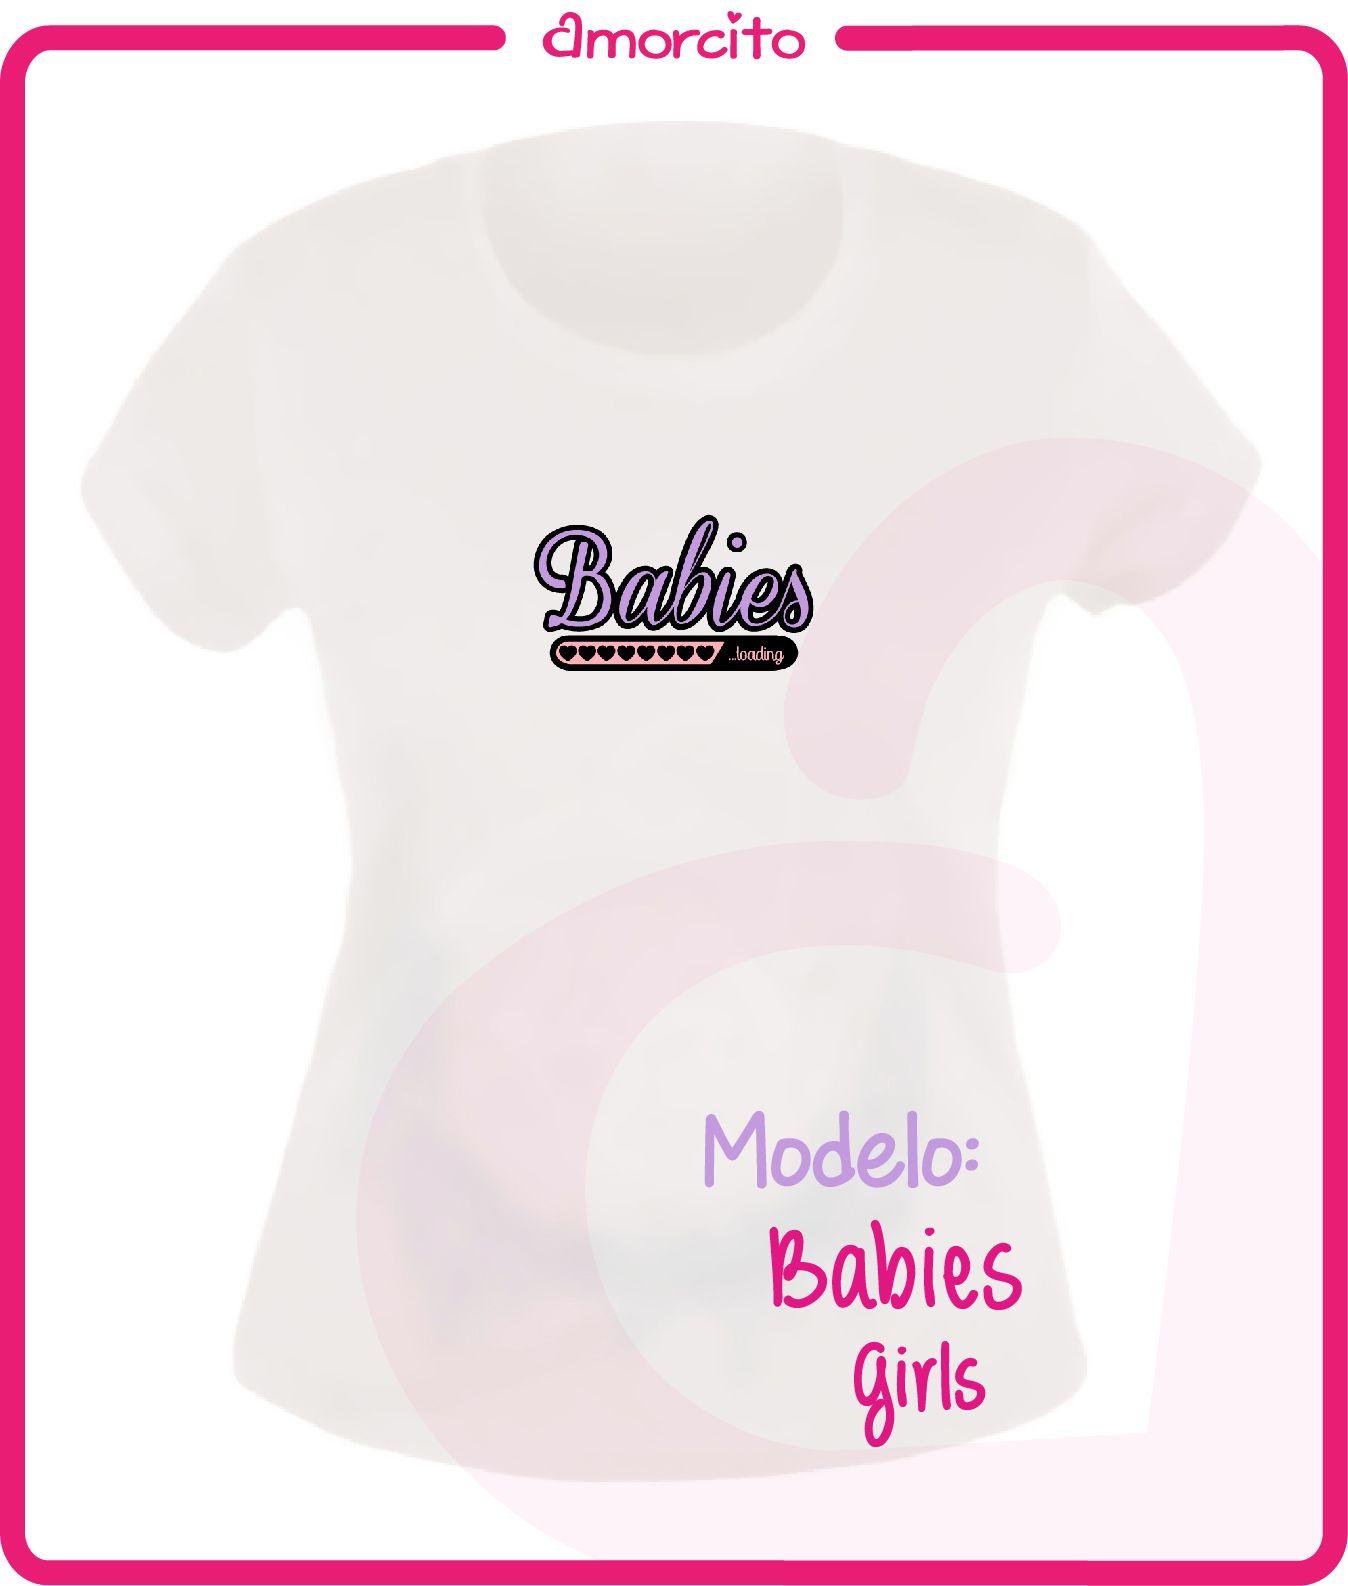 ¿Tienes #boutique? Solicita ser distribuidor de Amorcito: amorcito.mexico@gmail.com  #Ropa #embarazo #Moda #embarazada #tshirts #maternity #pregnant #pregnancy #preggo #apparel #clothing #outfit #twins